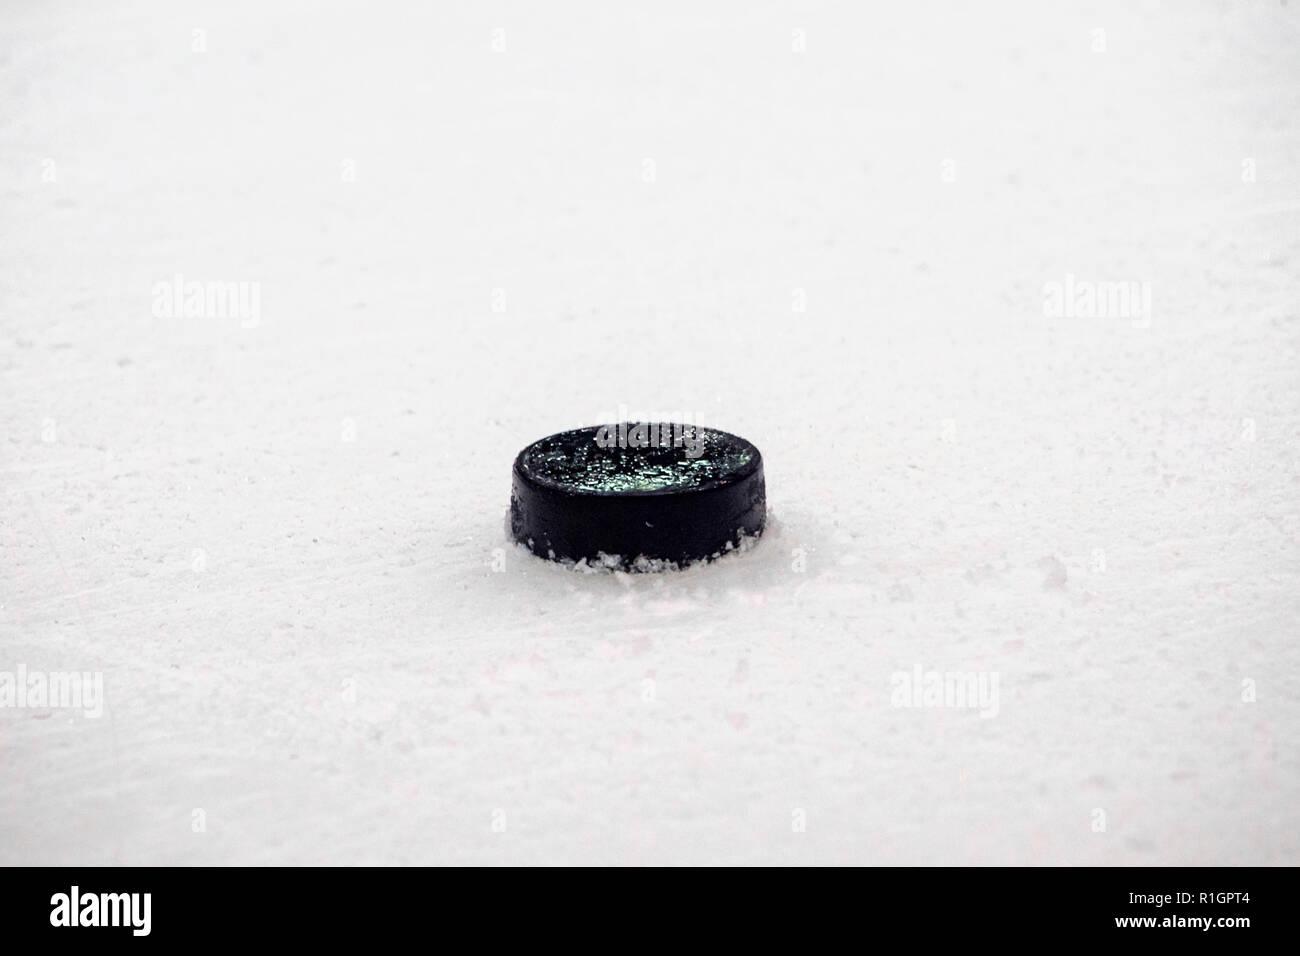 black hockey puck on ice rink. Winter sport. - Stock Image